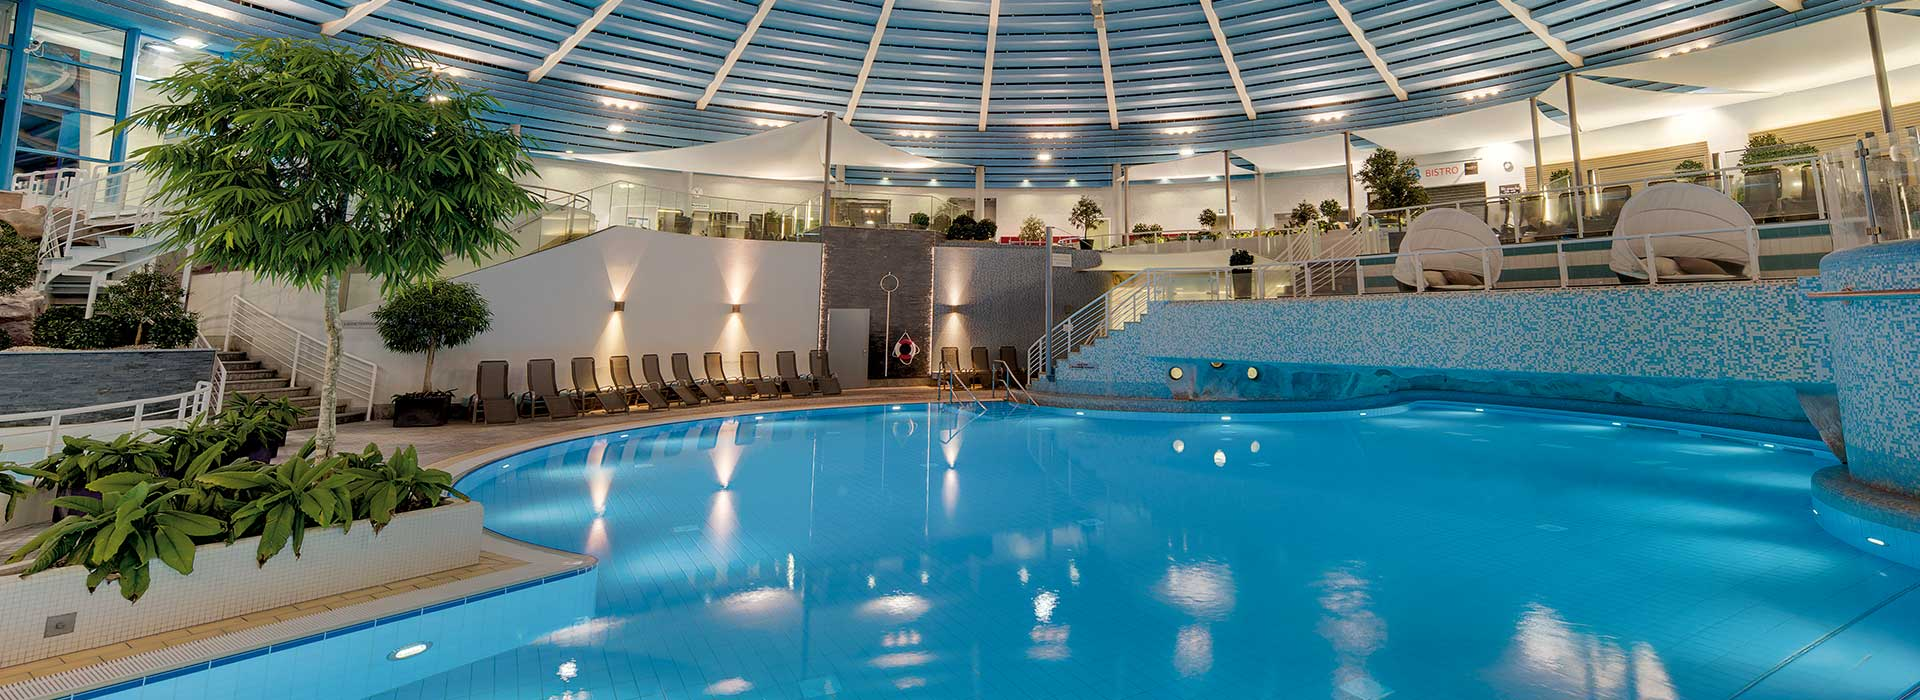 H2Oberhof Wellnessbad, Pool   © Oberhof Sportstätten GmbH